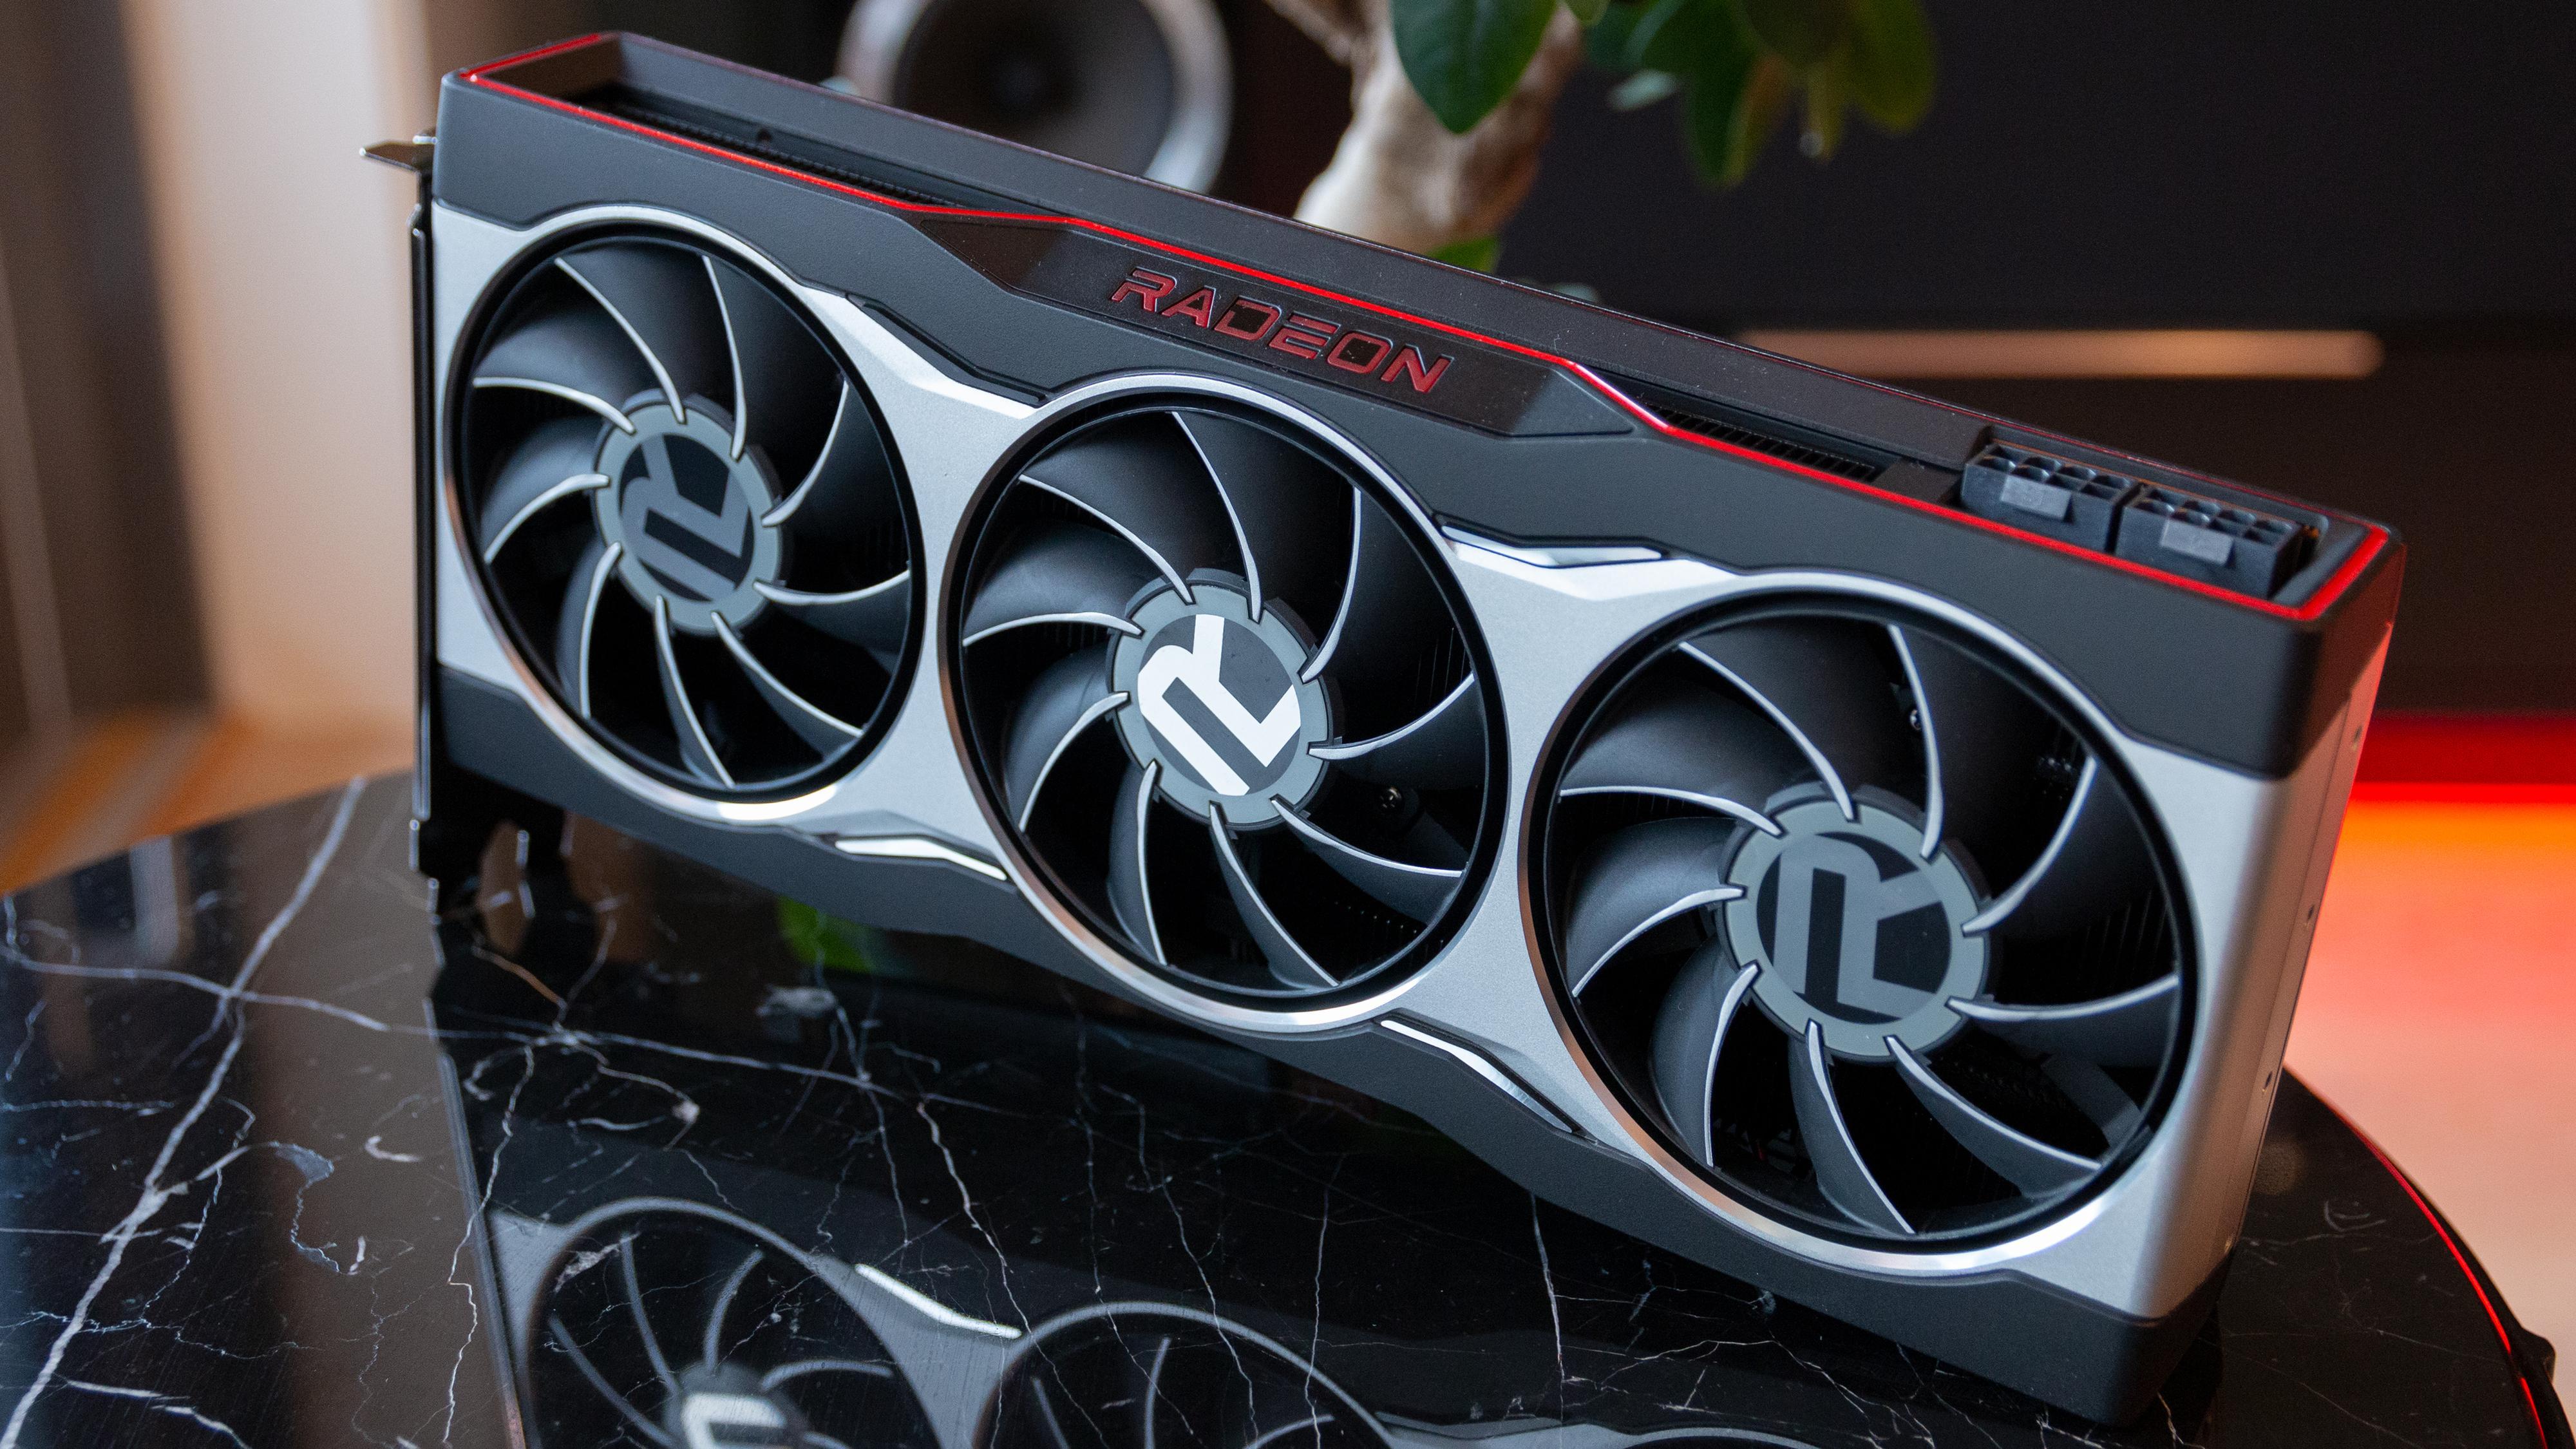 Radeon RX 6800.